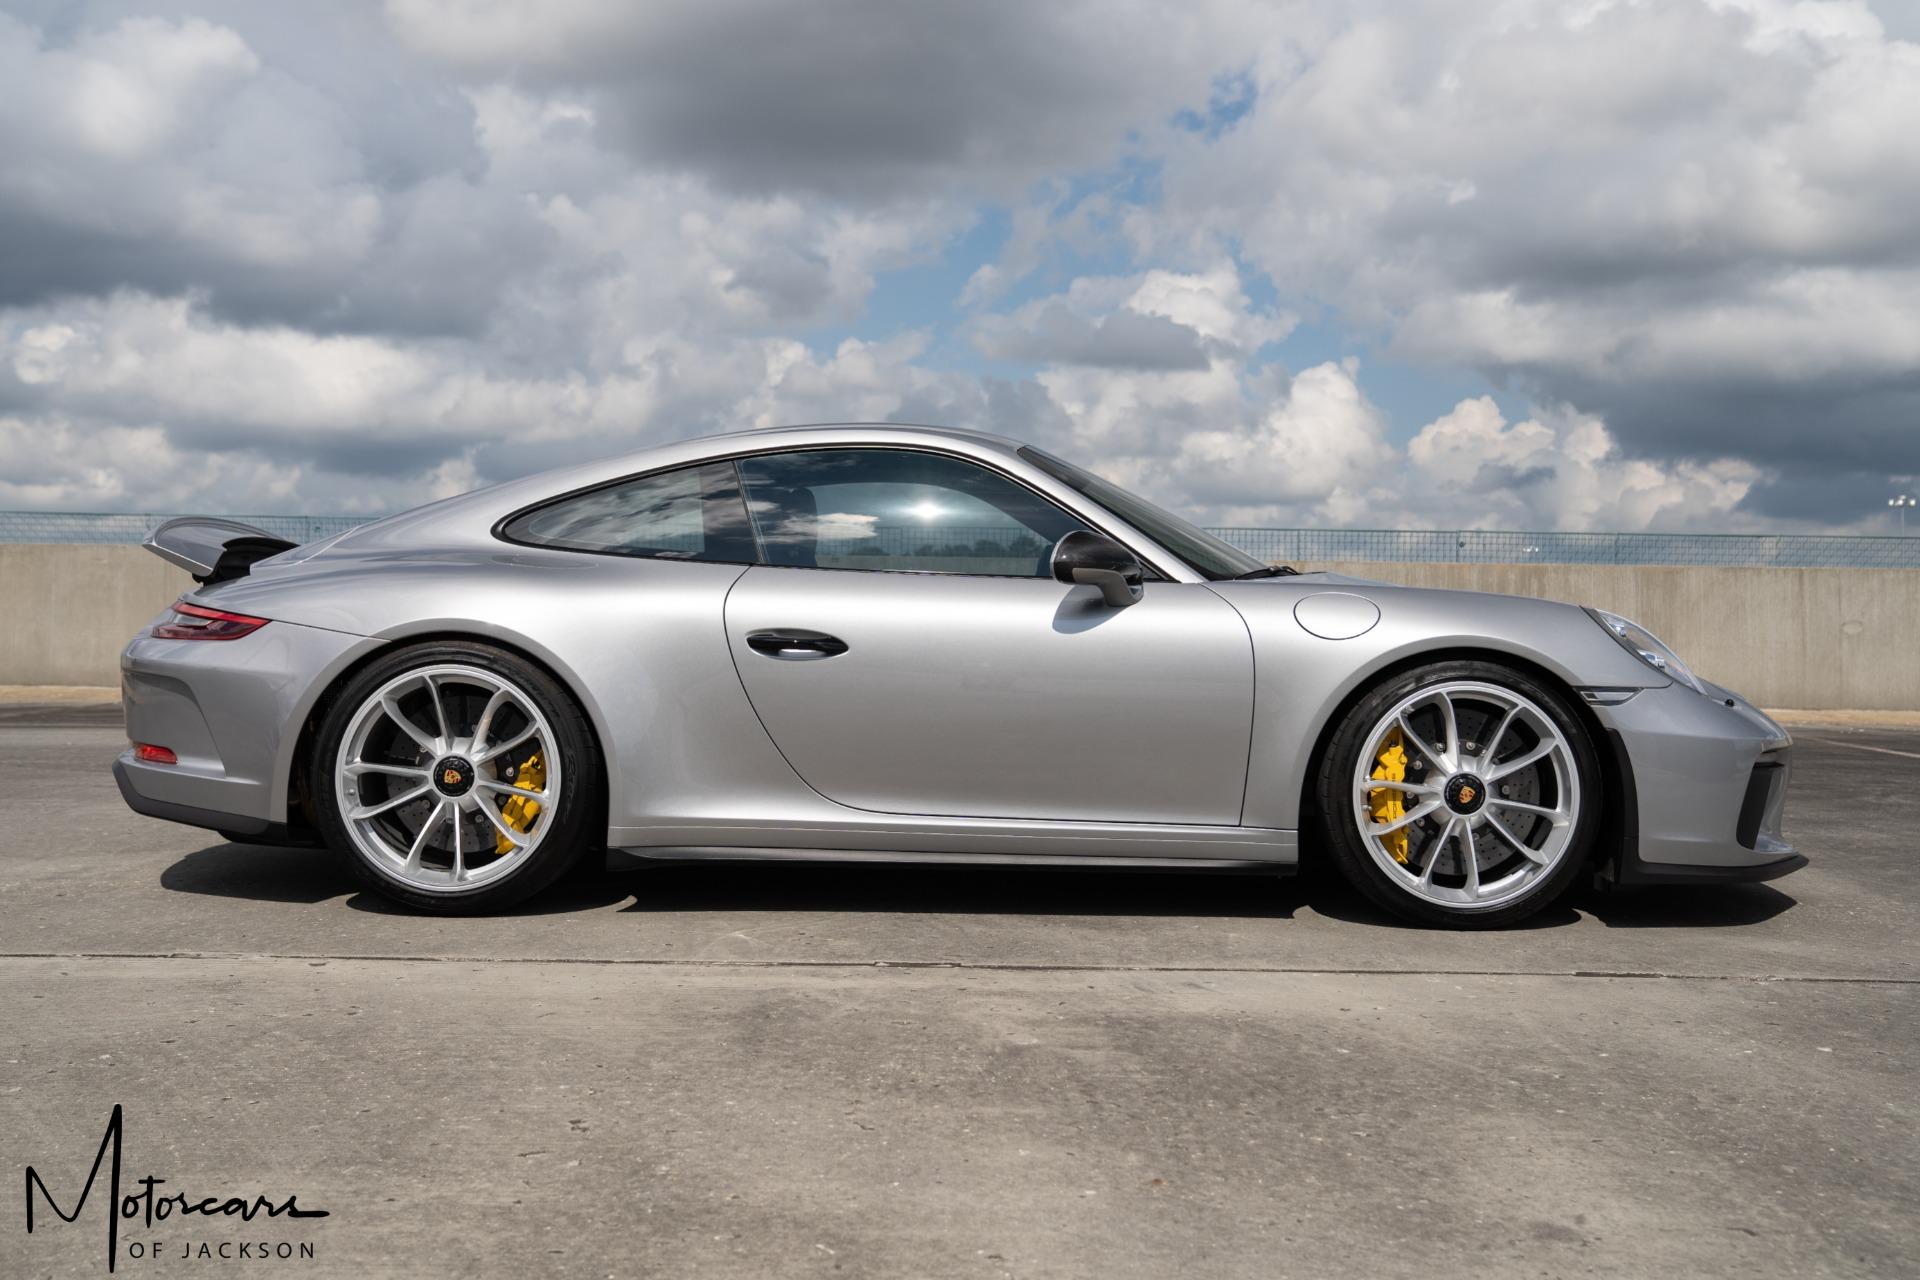 Used-2018-Porsche-911-GT3-Touring-Jackson-MS